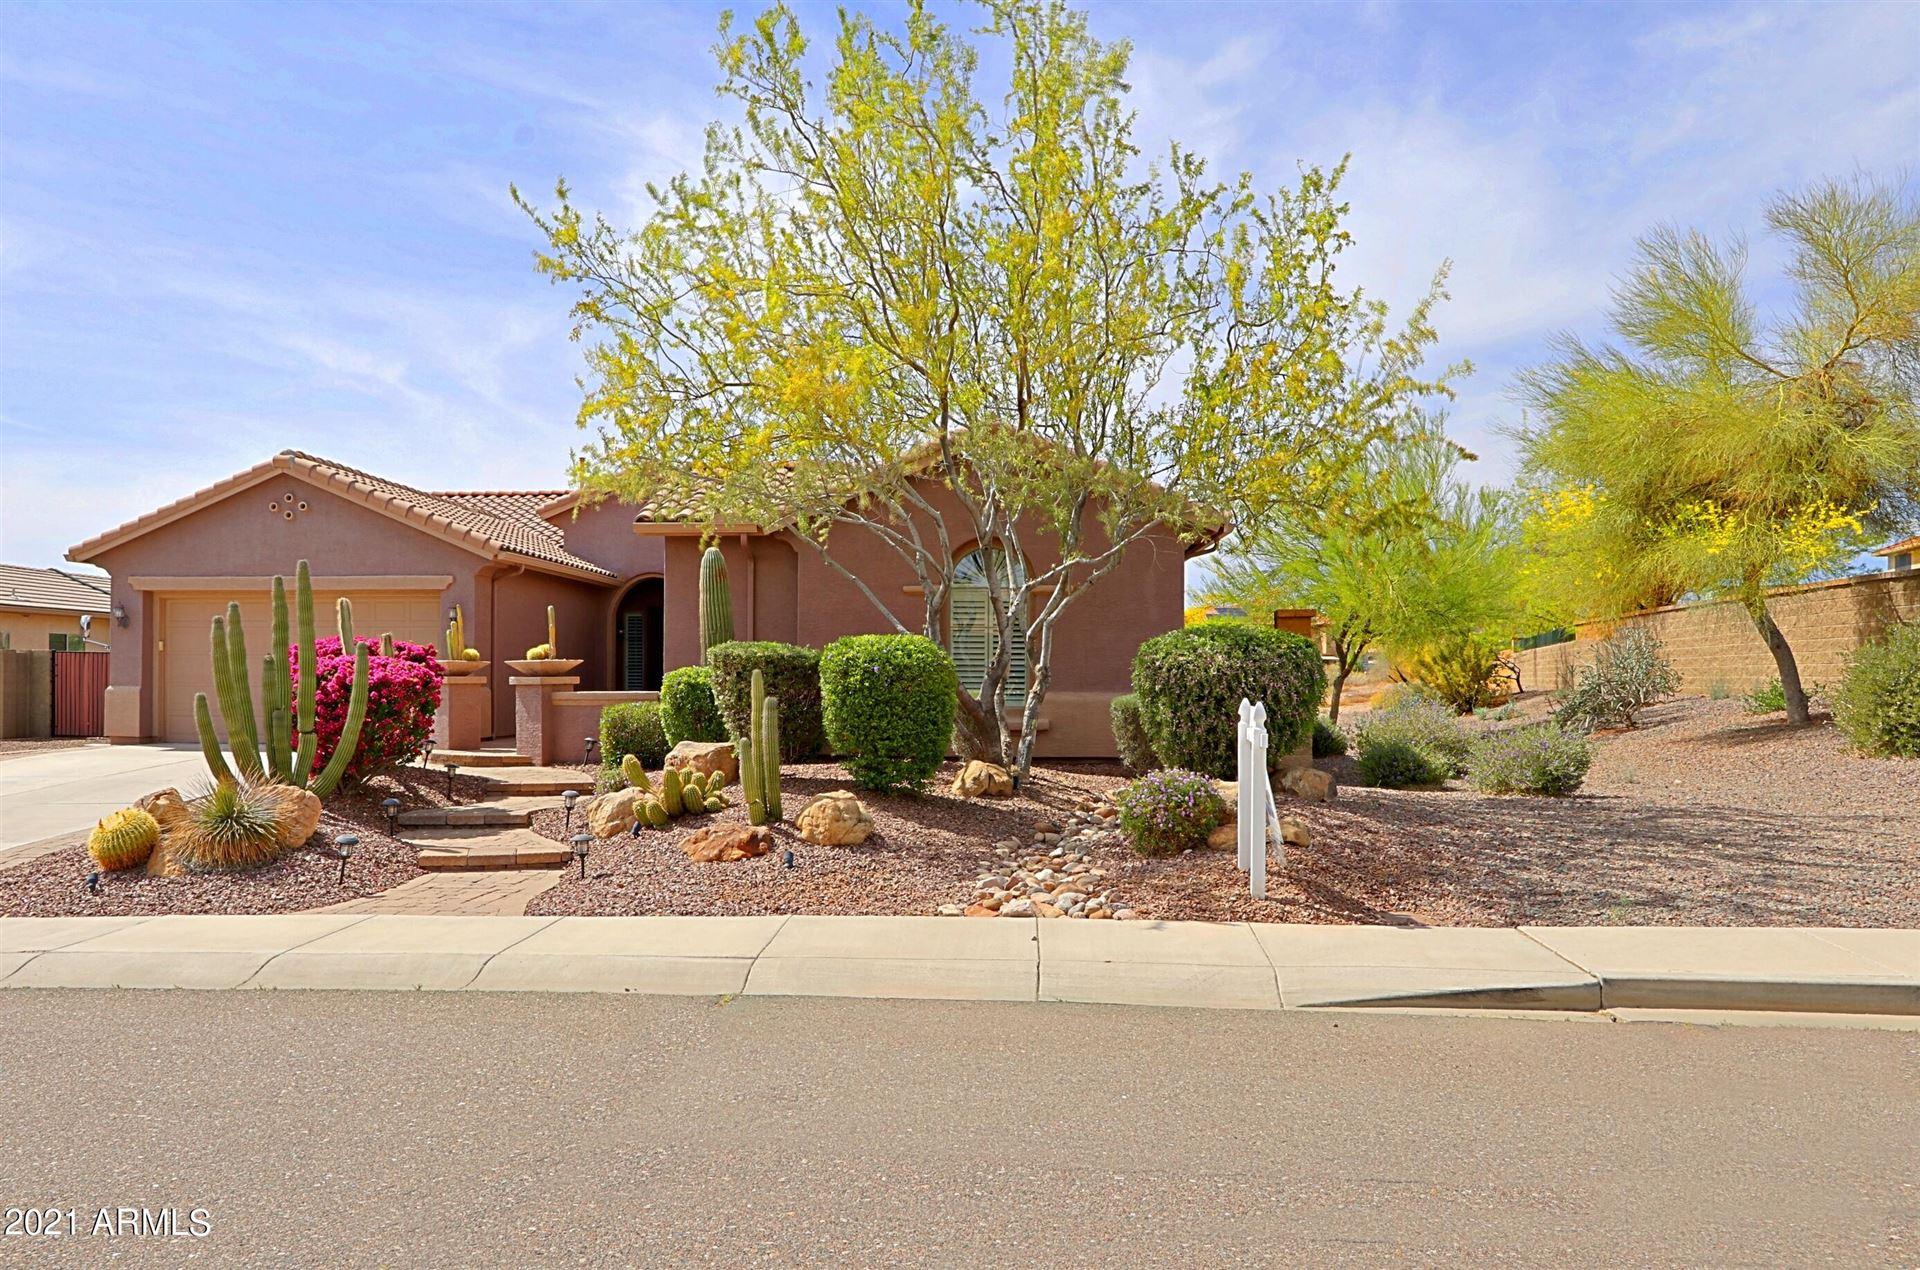 Photo of 43922 N 49TH Drive, New River, AZ 85087 (MLS # 6219505)